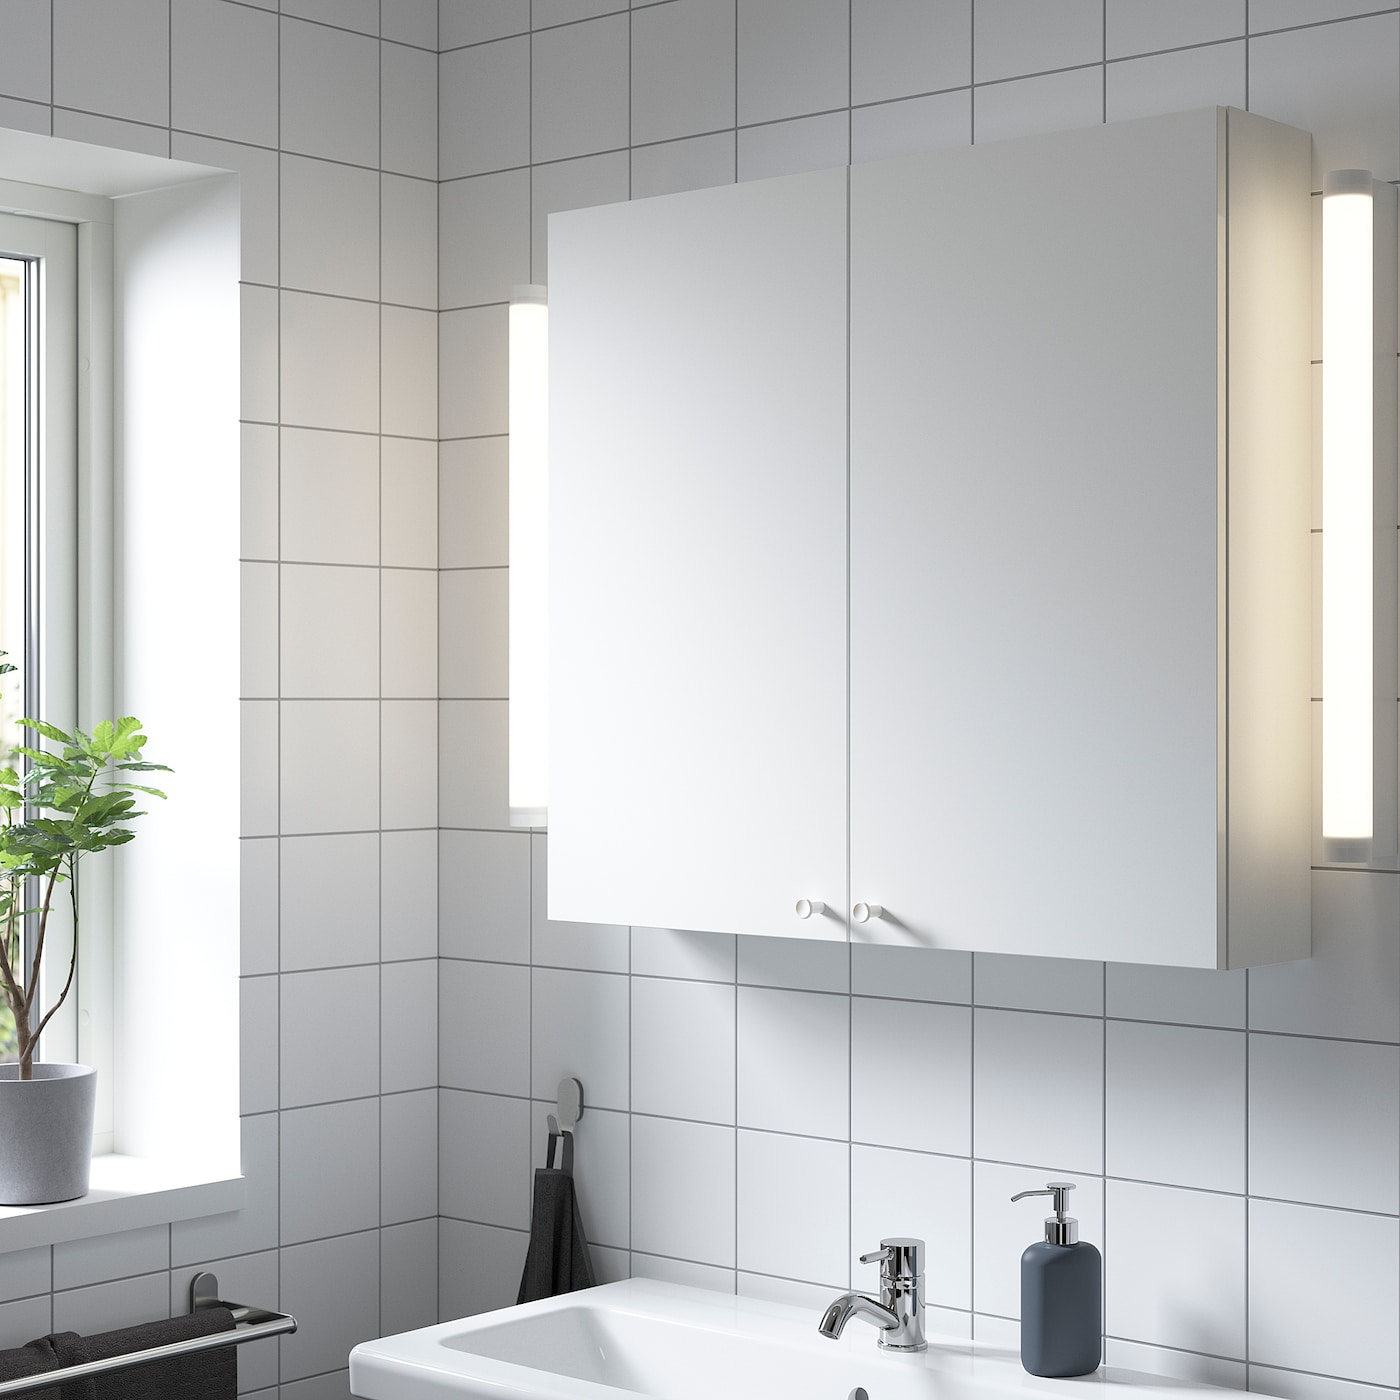 ENHET Wandschrank m 2 Böden/Türen, weiß, 80x17x75 cm